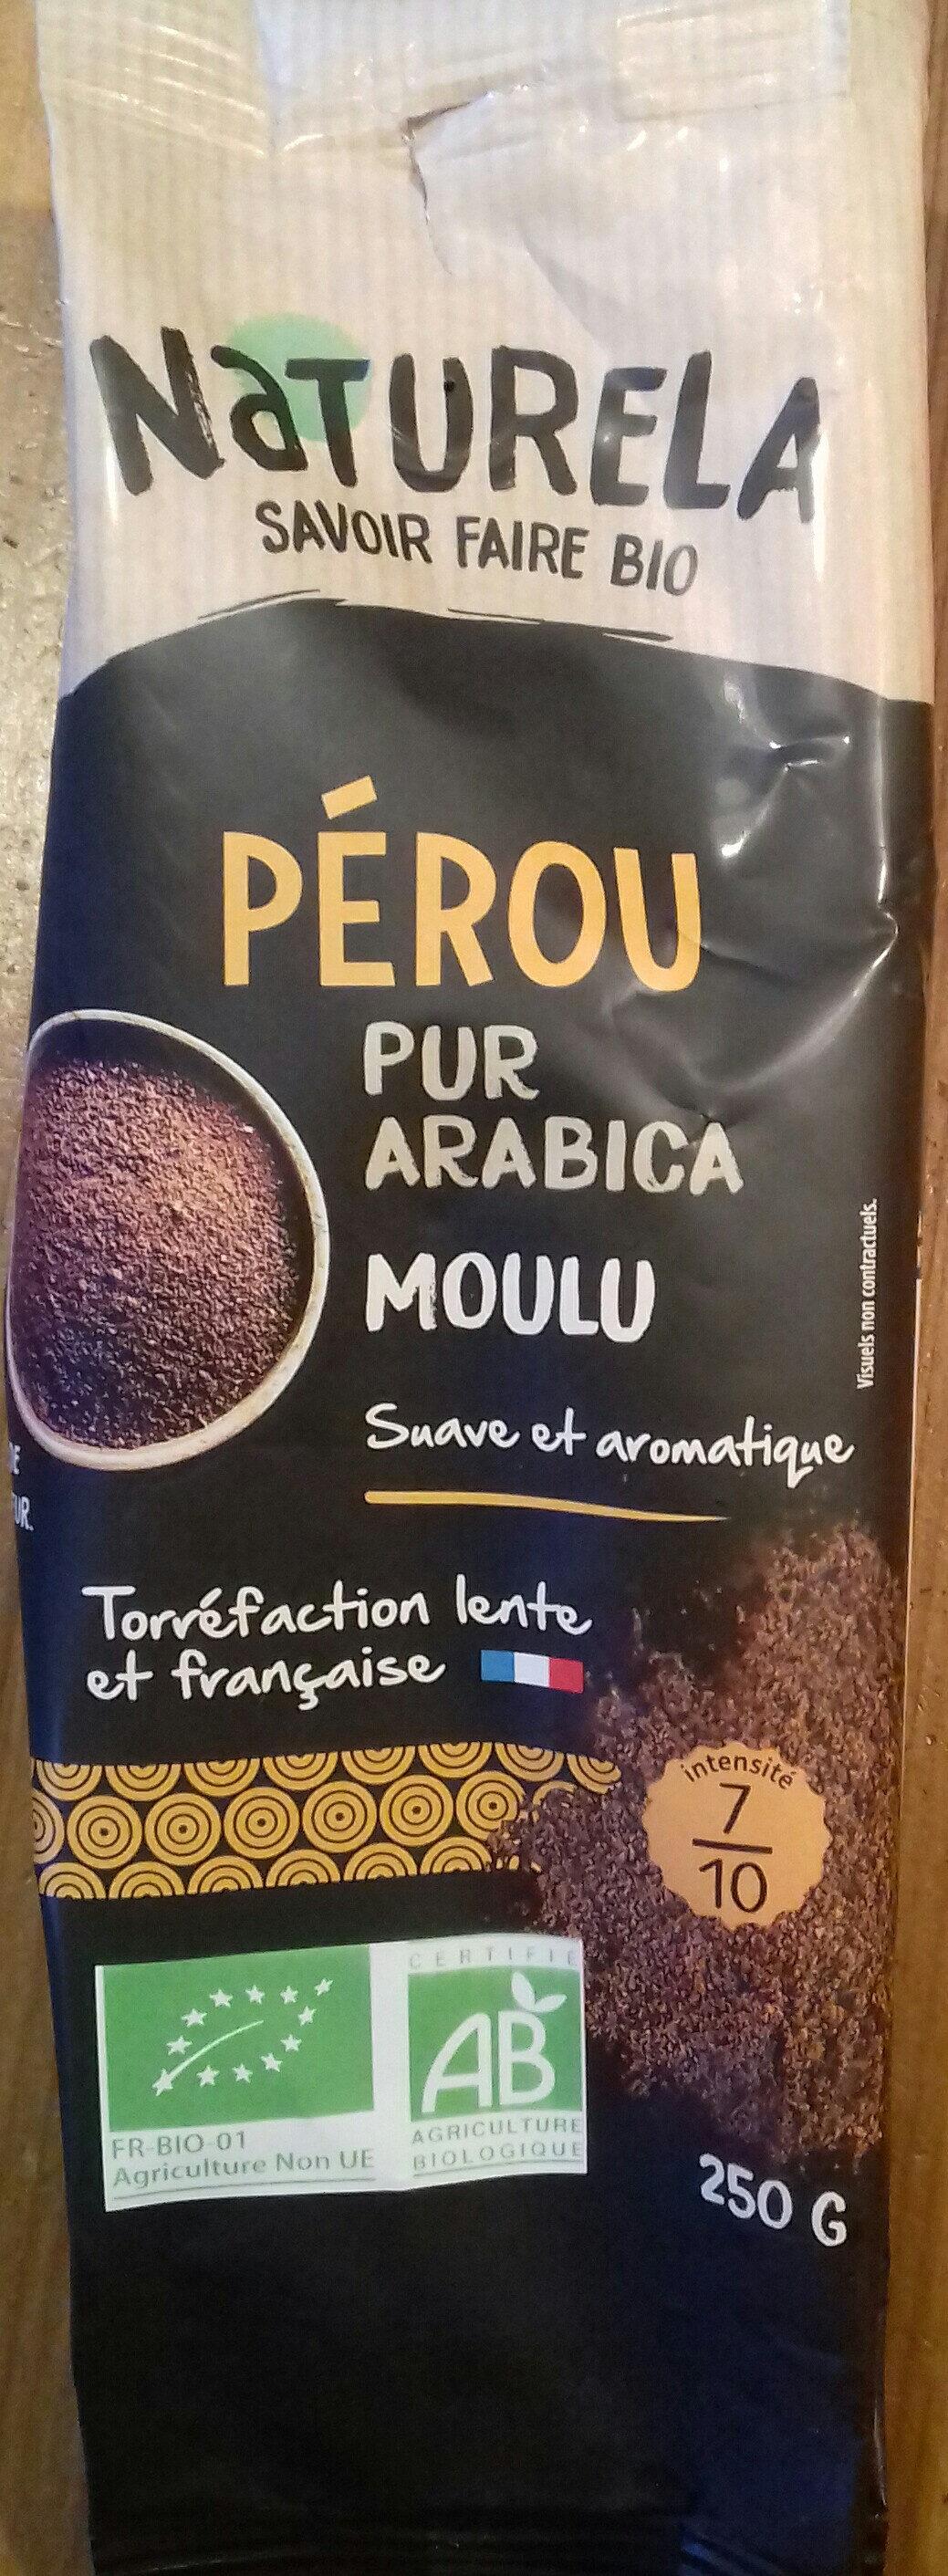 Café Pérou pur arabica moulu - Prodotto - fr